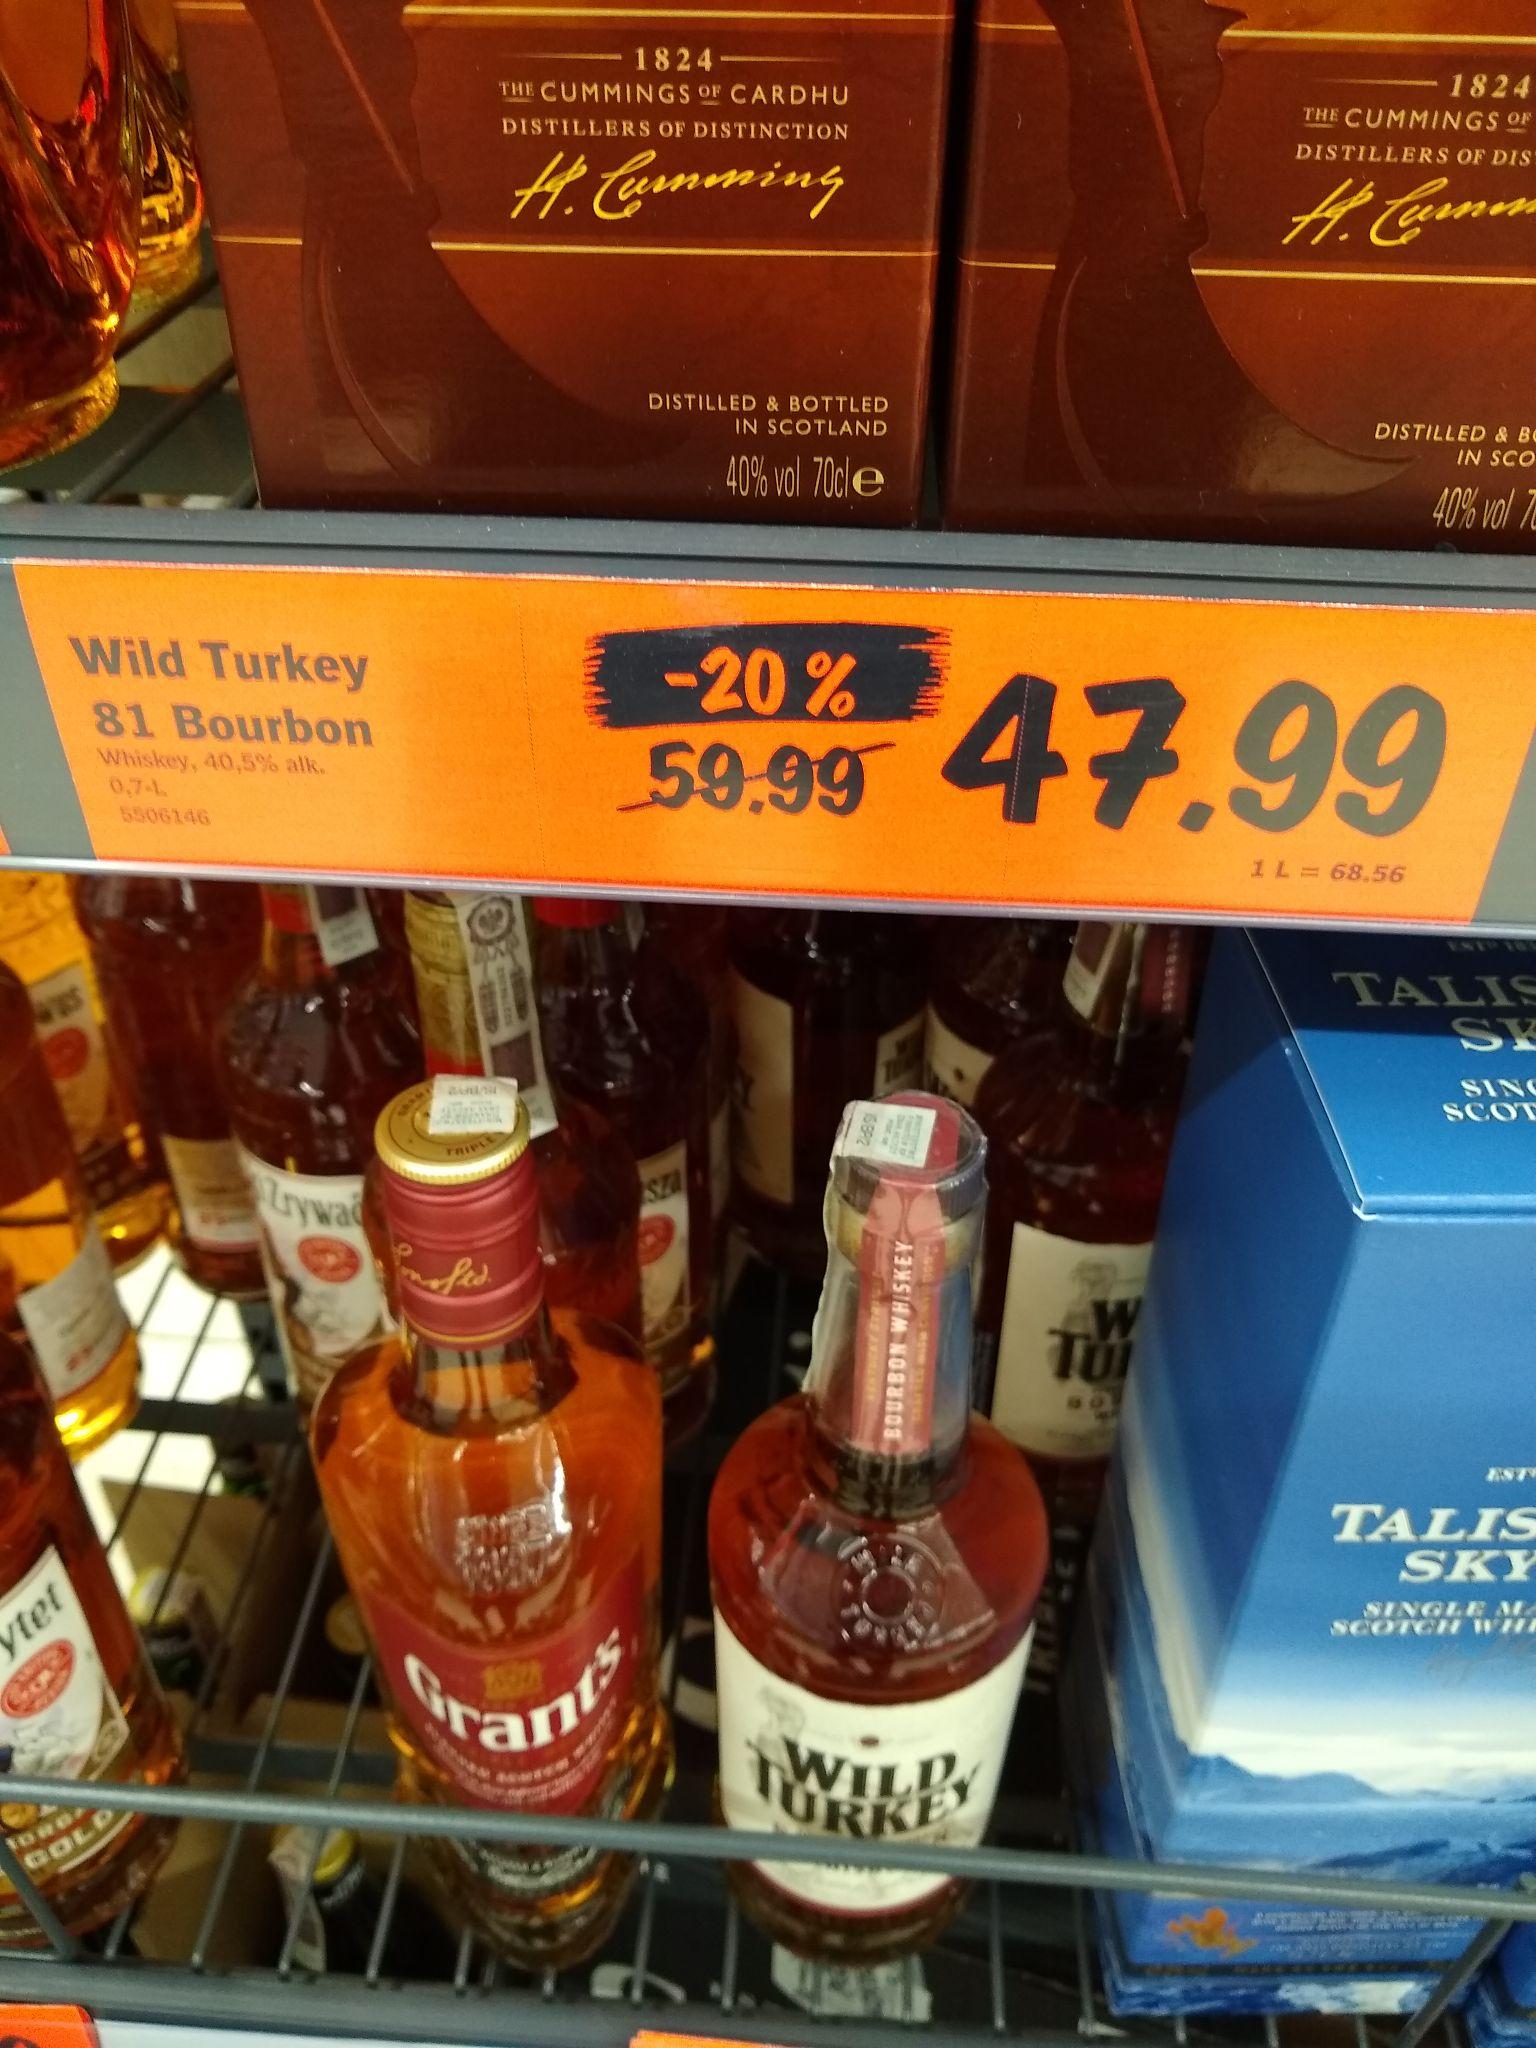 Wild Turkey 81 bourbon whiskey whisky Lidl